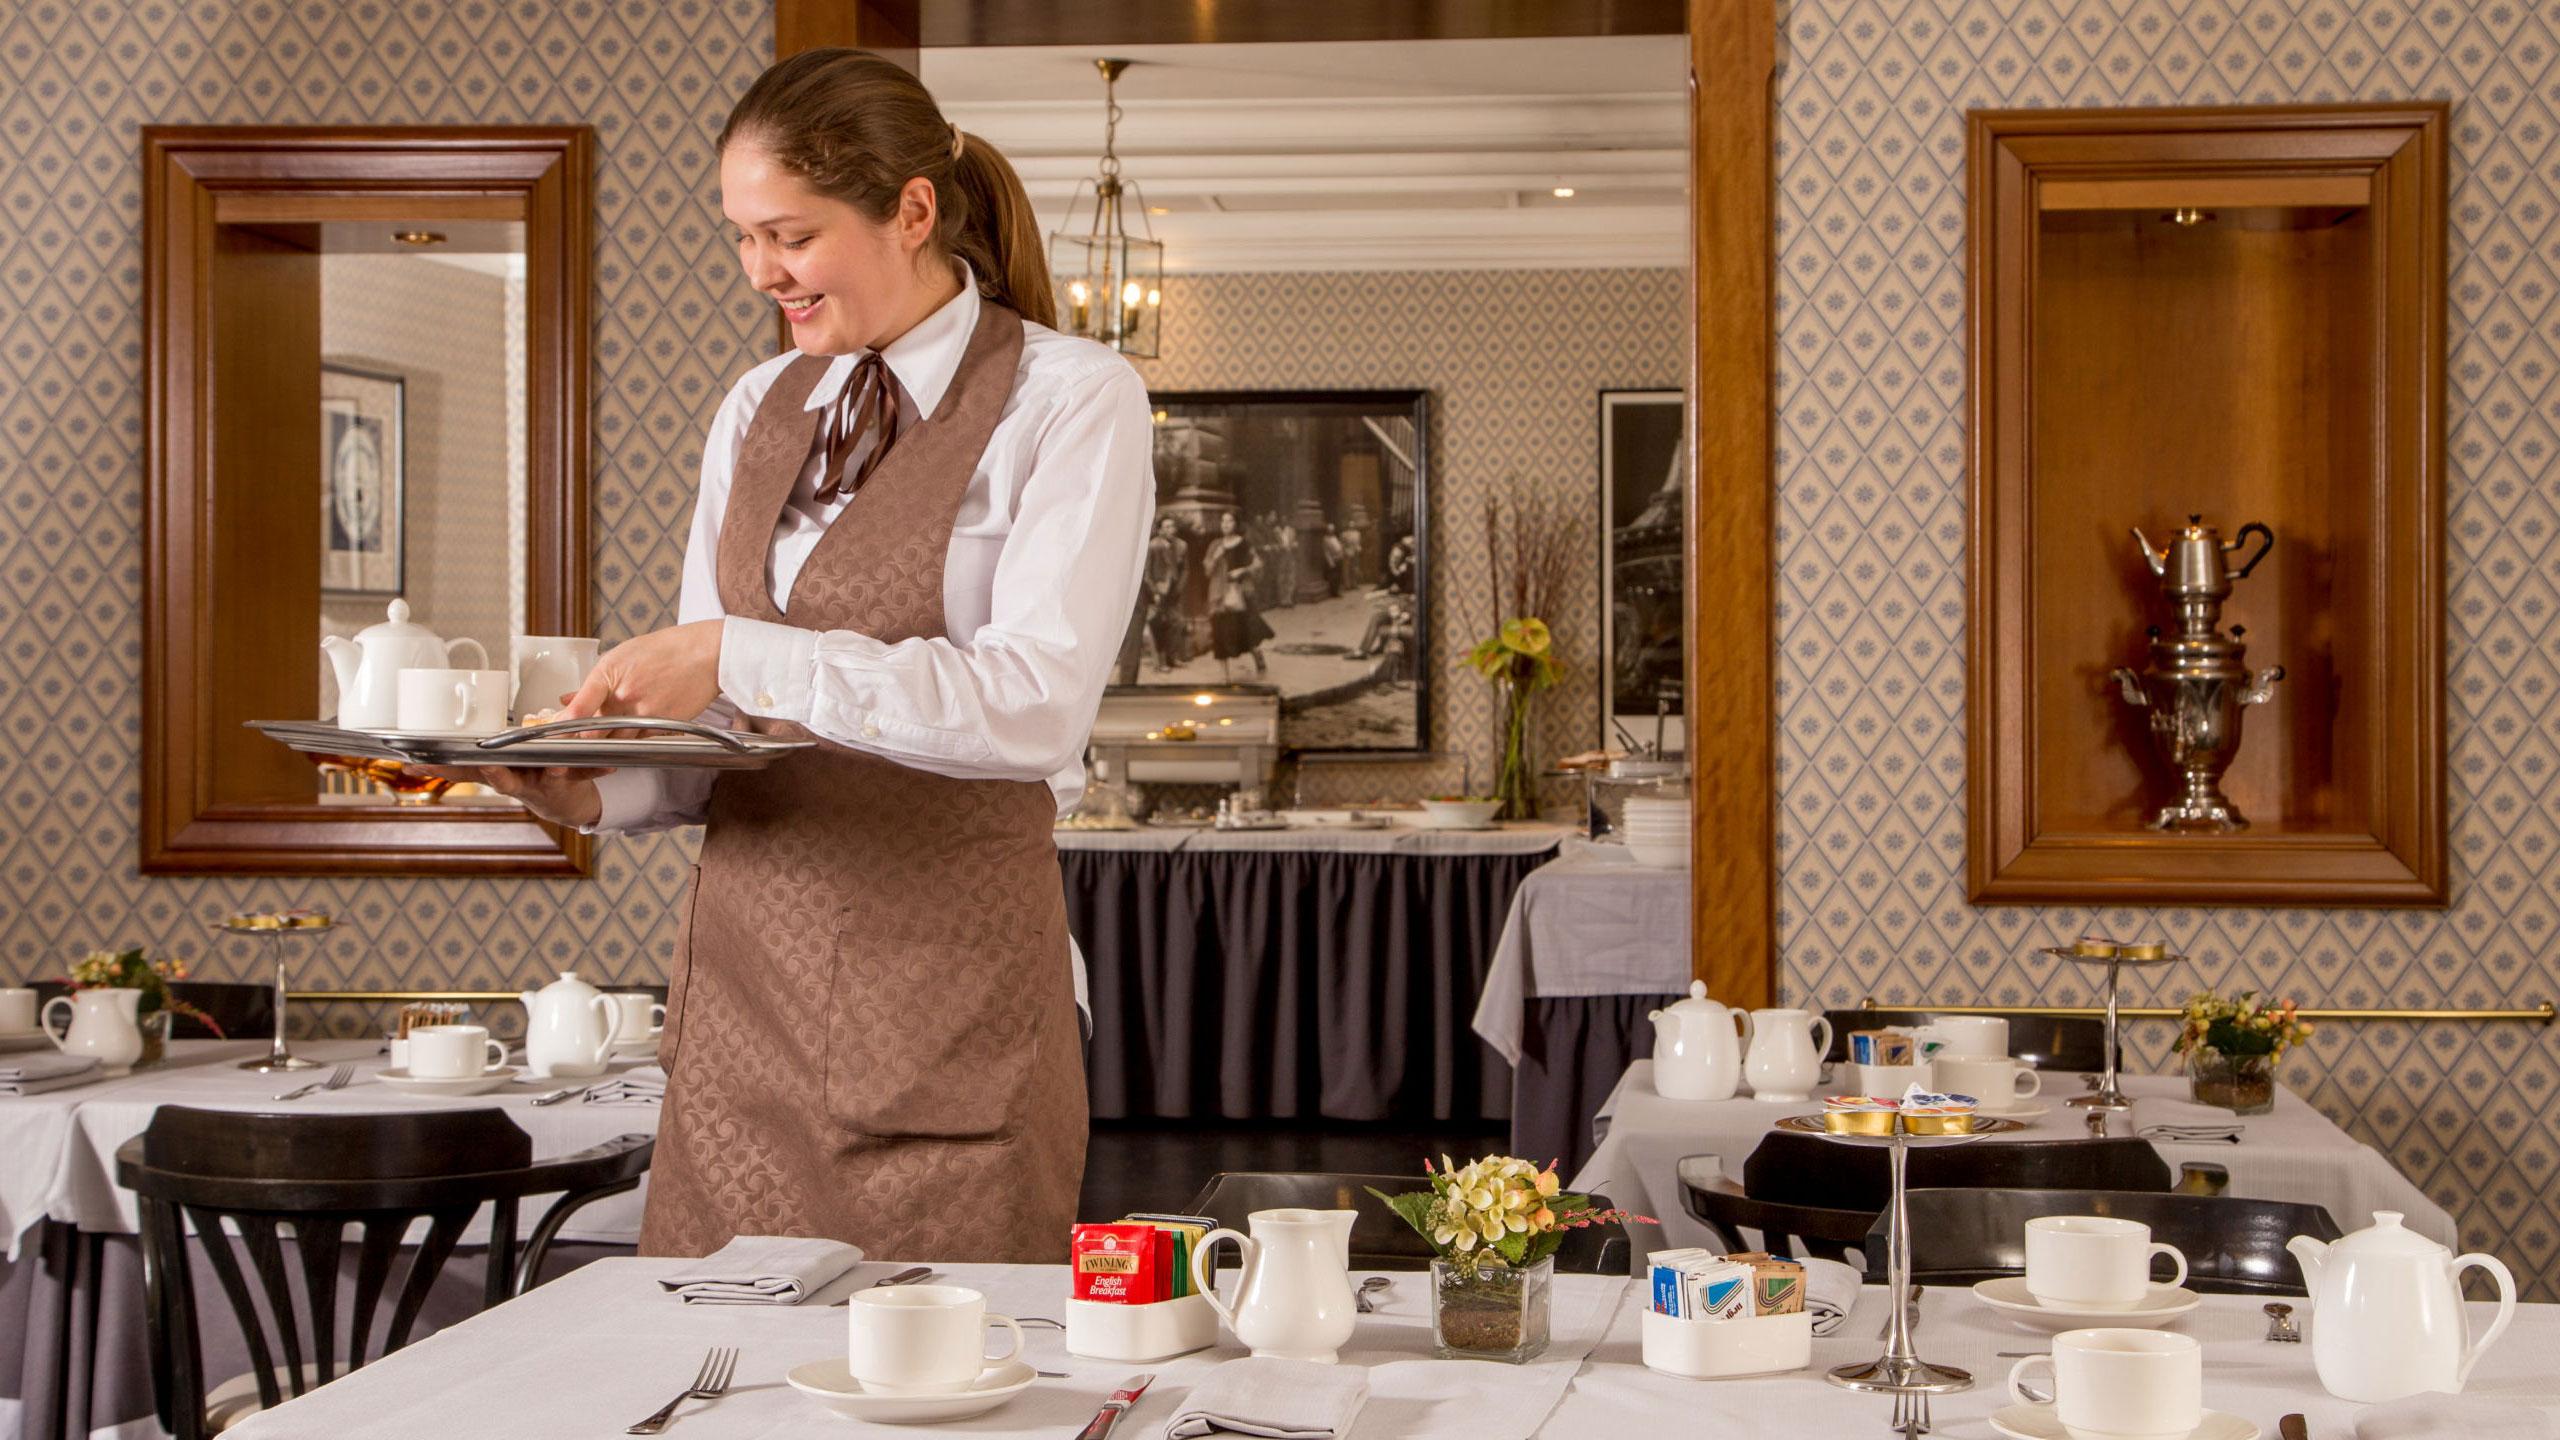 albergo-ottocento-rome-breakfast-03